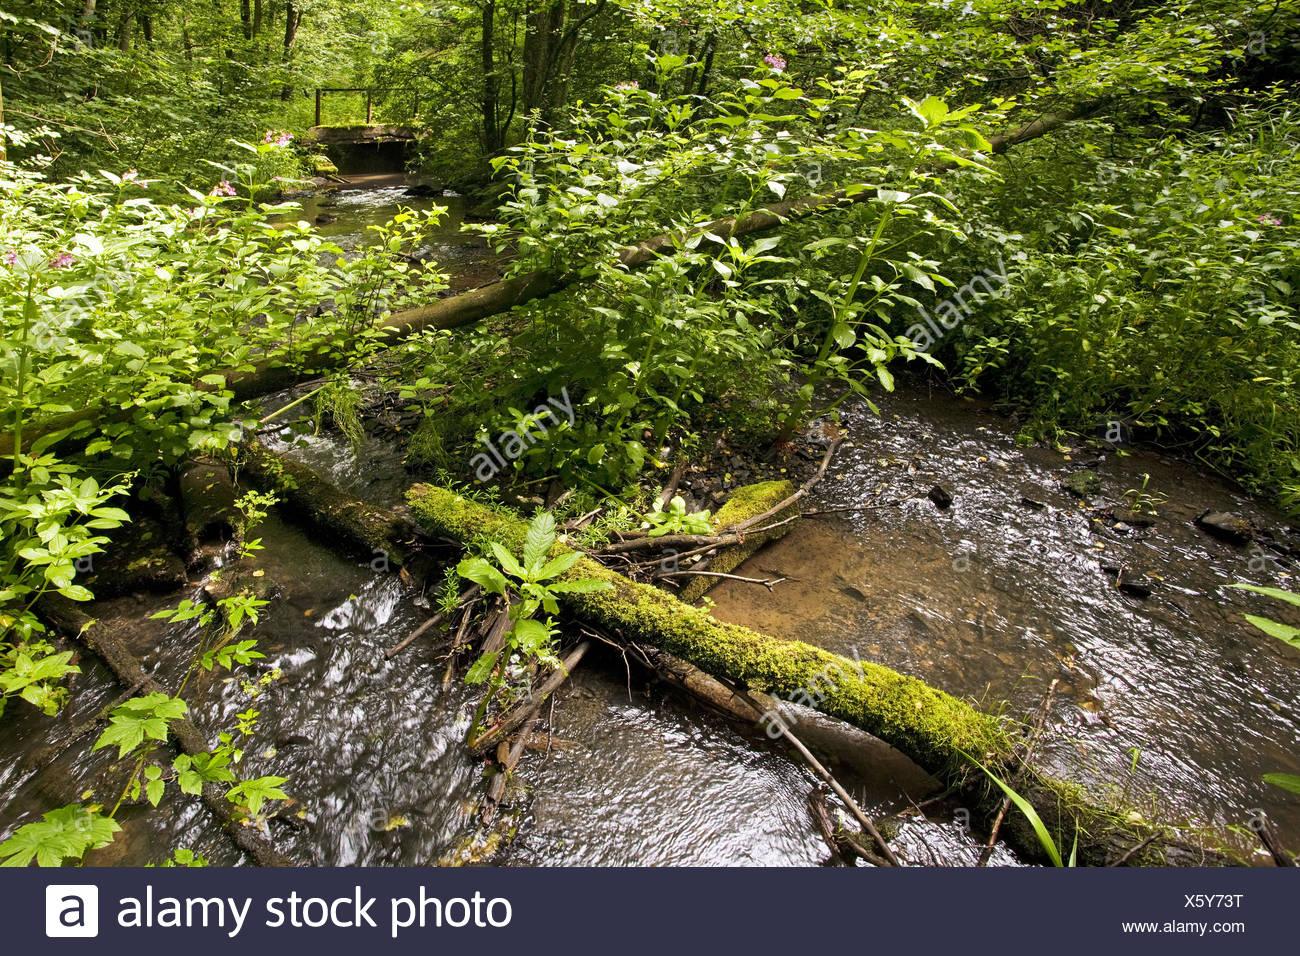 Landscape Elbschebach, Witten, Germany - Stock Image